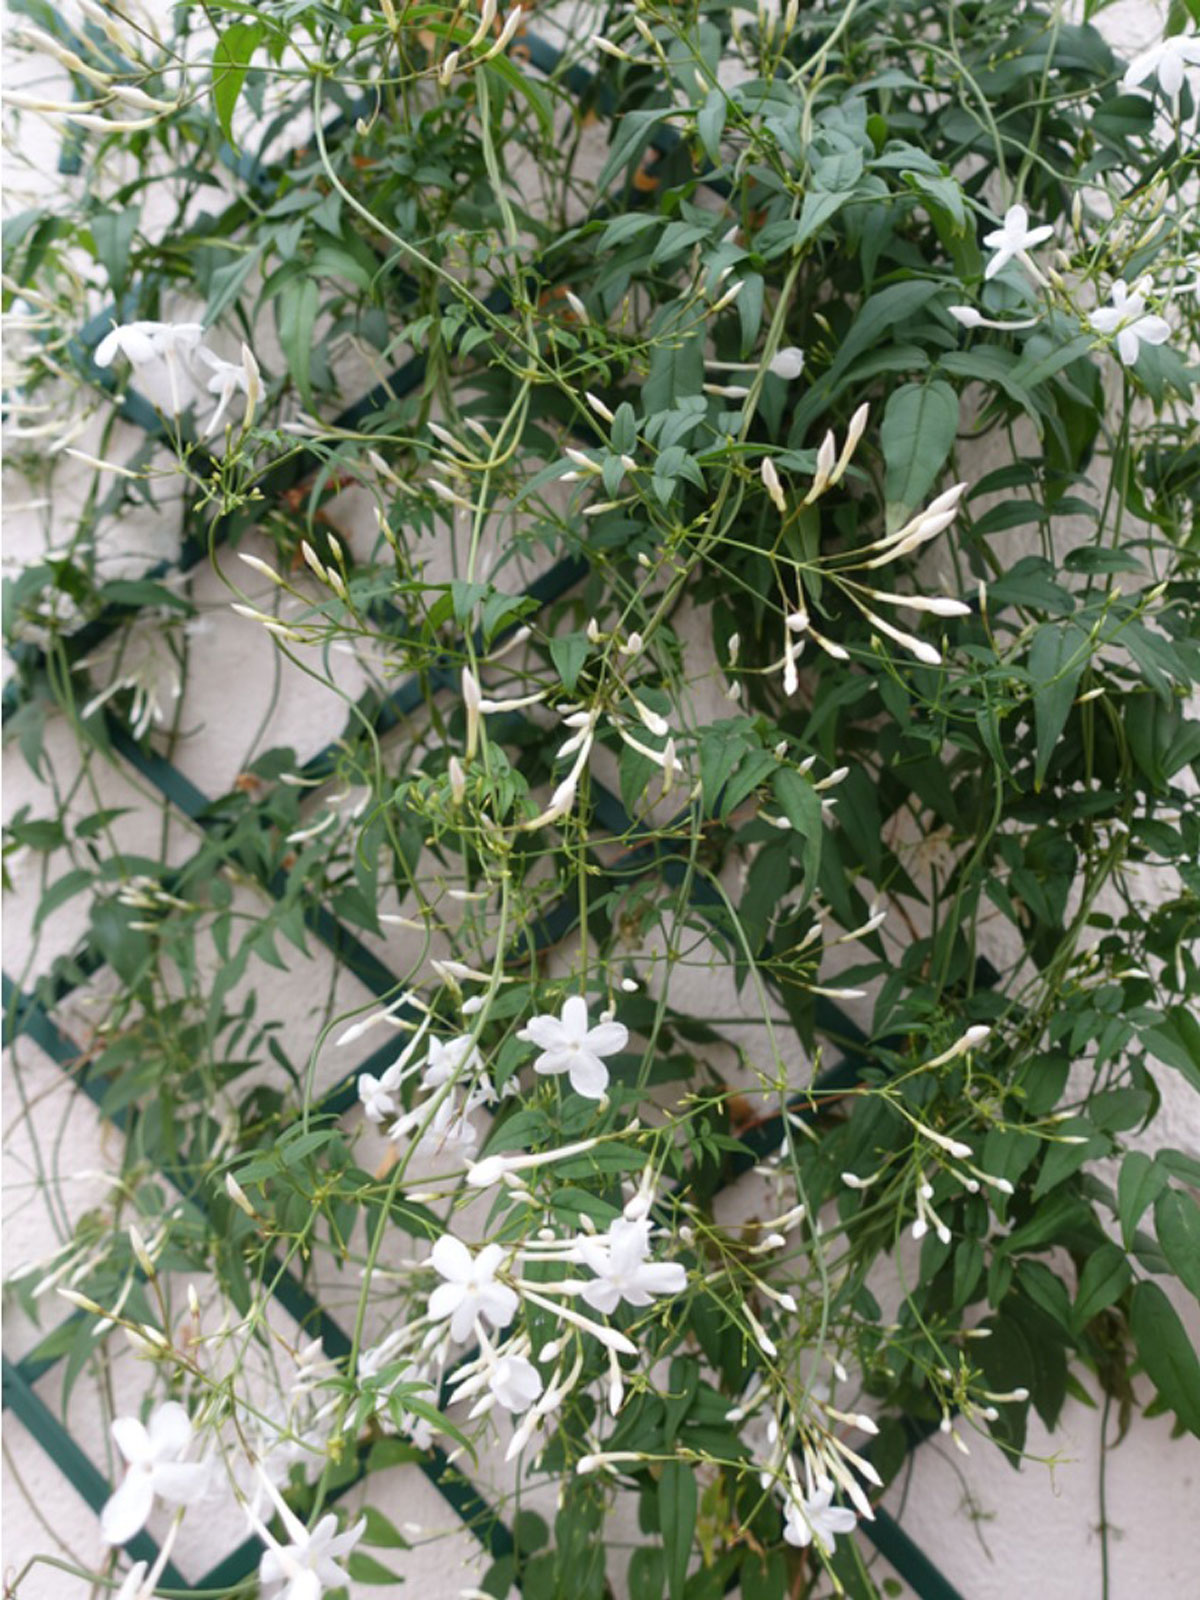 Growing Jasmine On A Trellis Or Wall: How To Train Jasmine ...